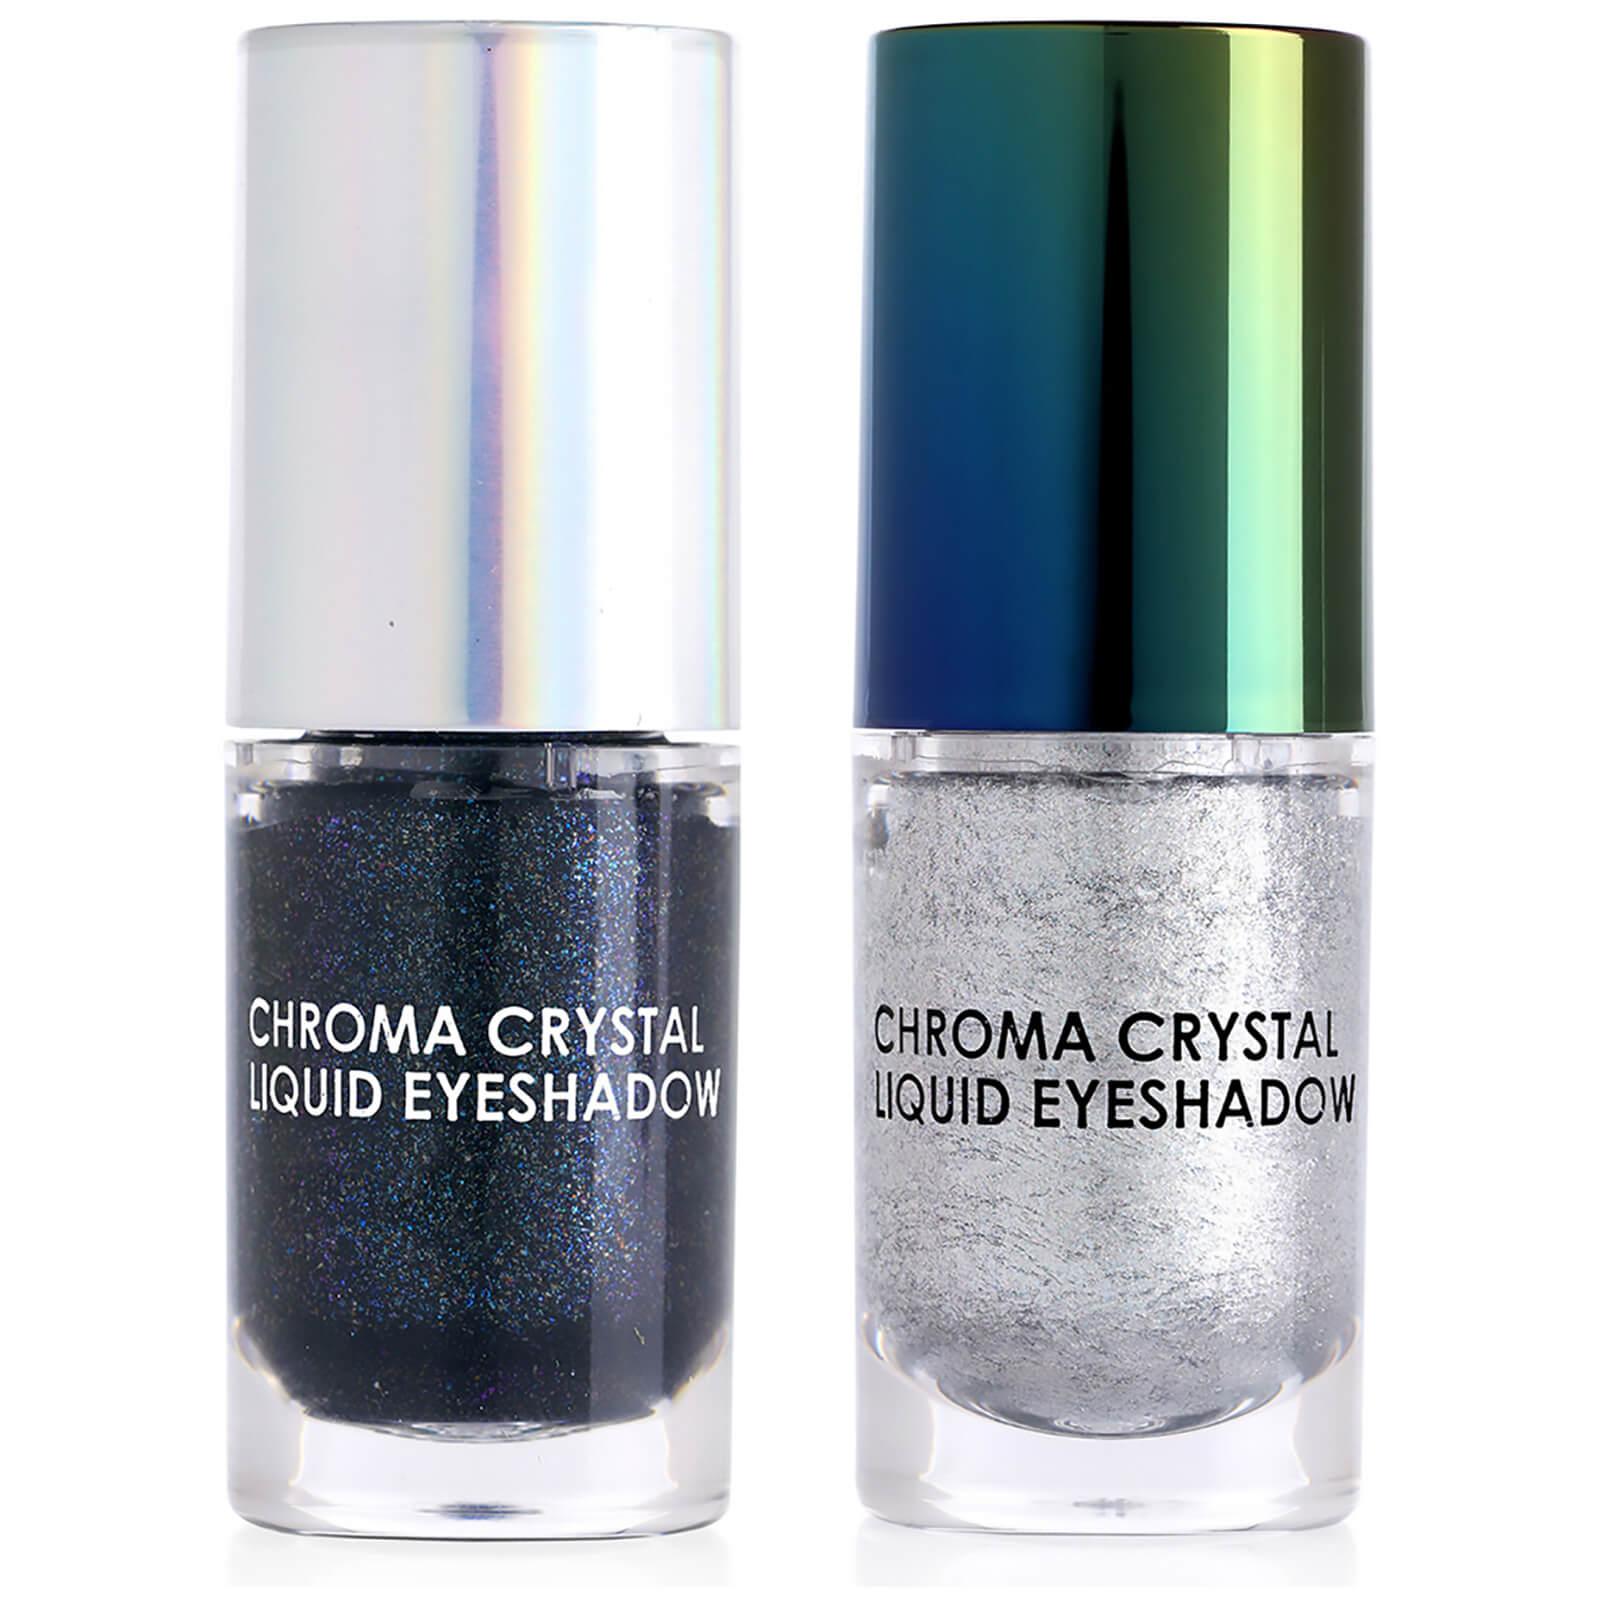 Купить Natasha Denona Chroma Crystal Liquid Eyeshadow - Disco and Space 4ml